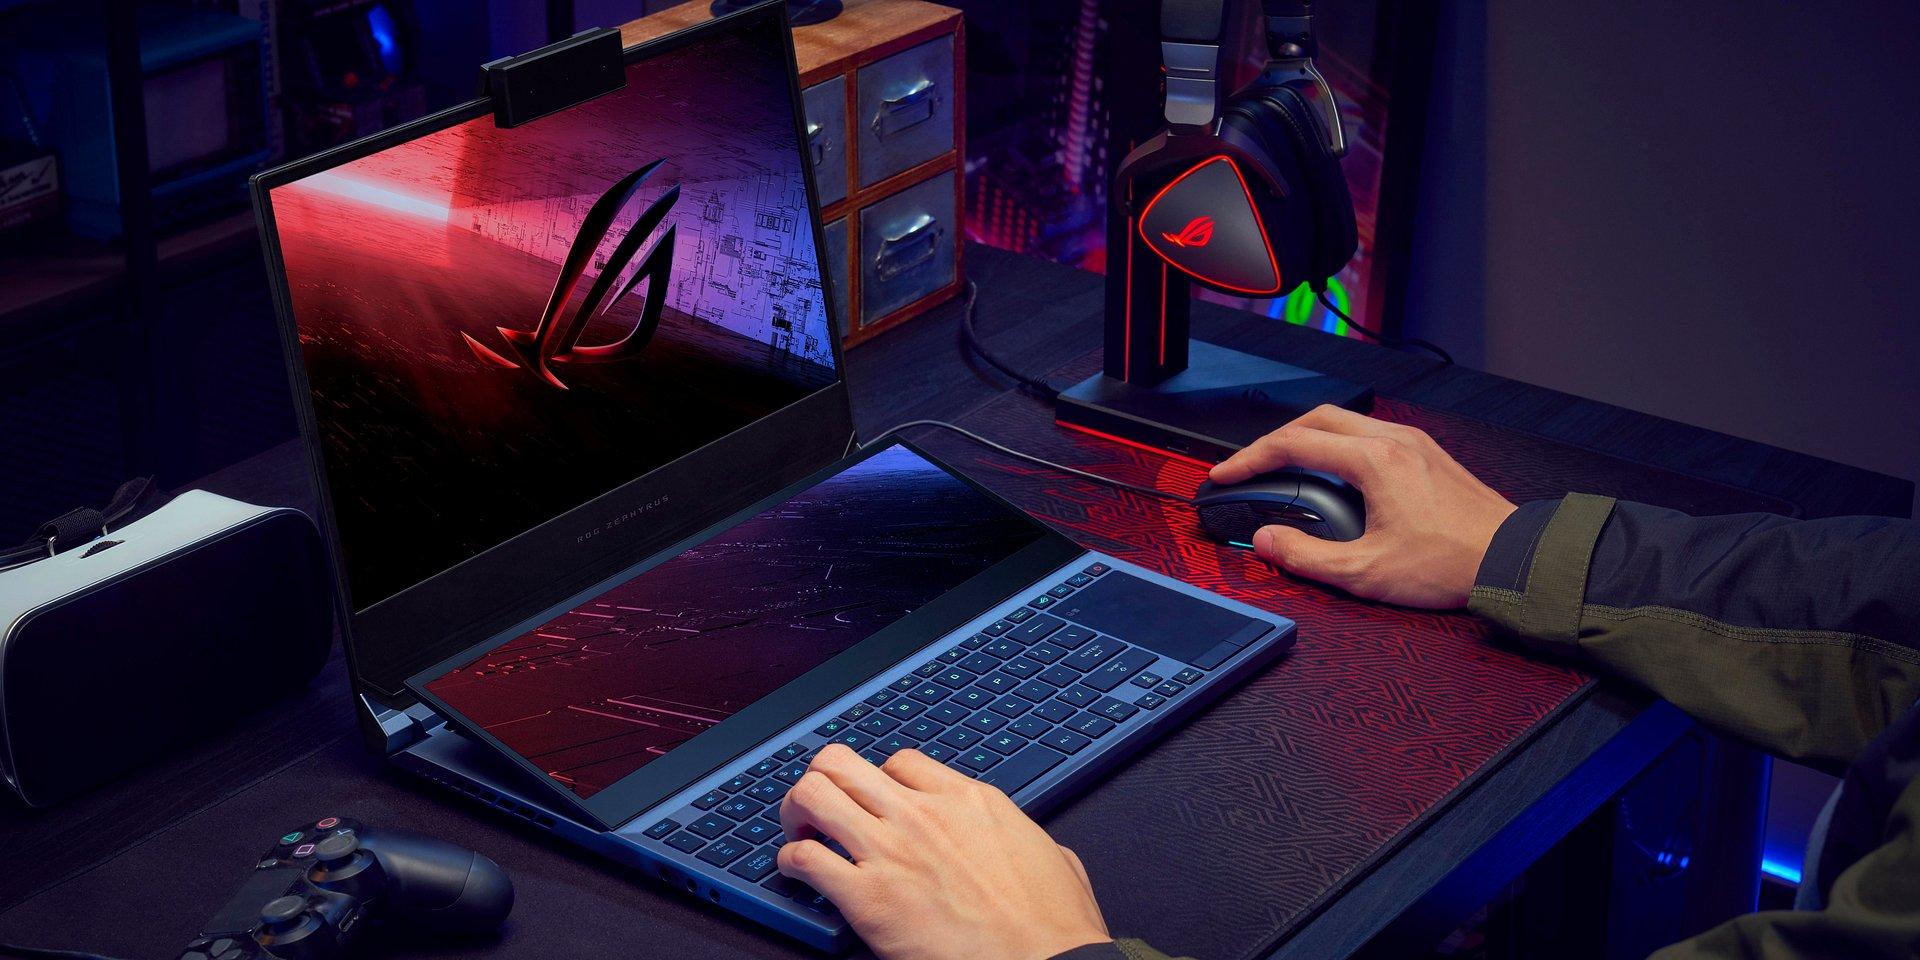 ASUS Republic of Gamers przedstawia dwuekranowy laptop Zephyrus Duo 15